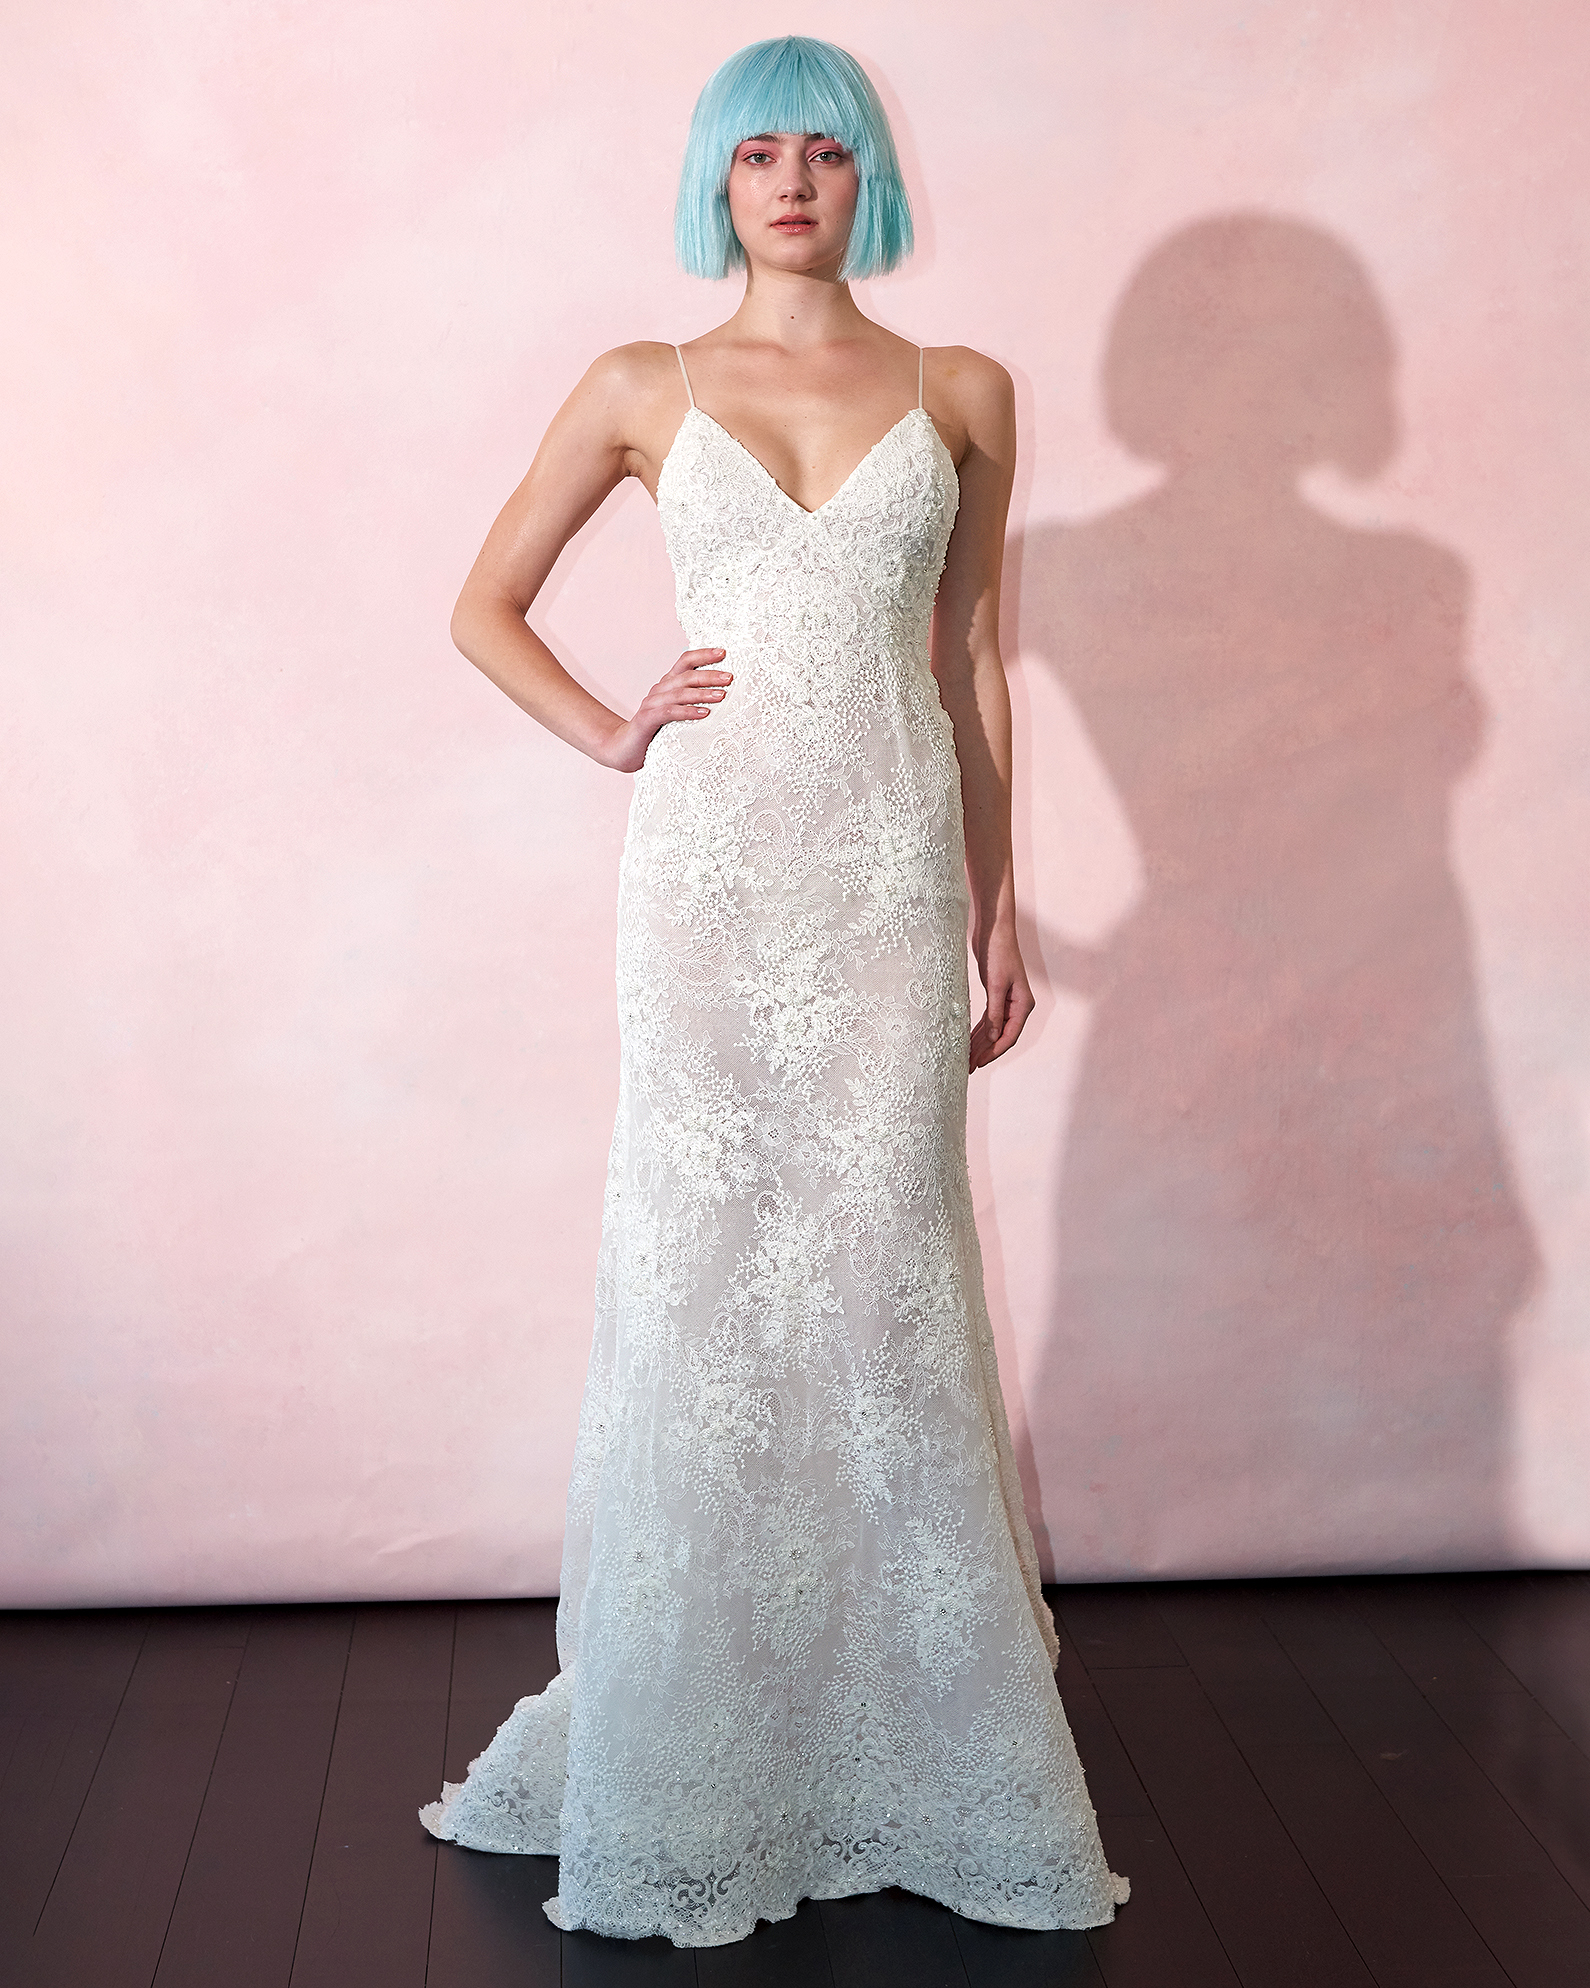 isabelle armstrong wedding dress spring 2019 spaghetti-strap v-neck sheath